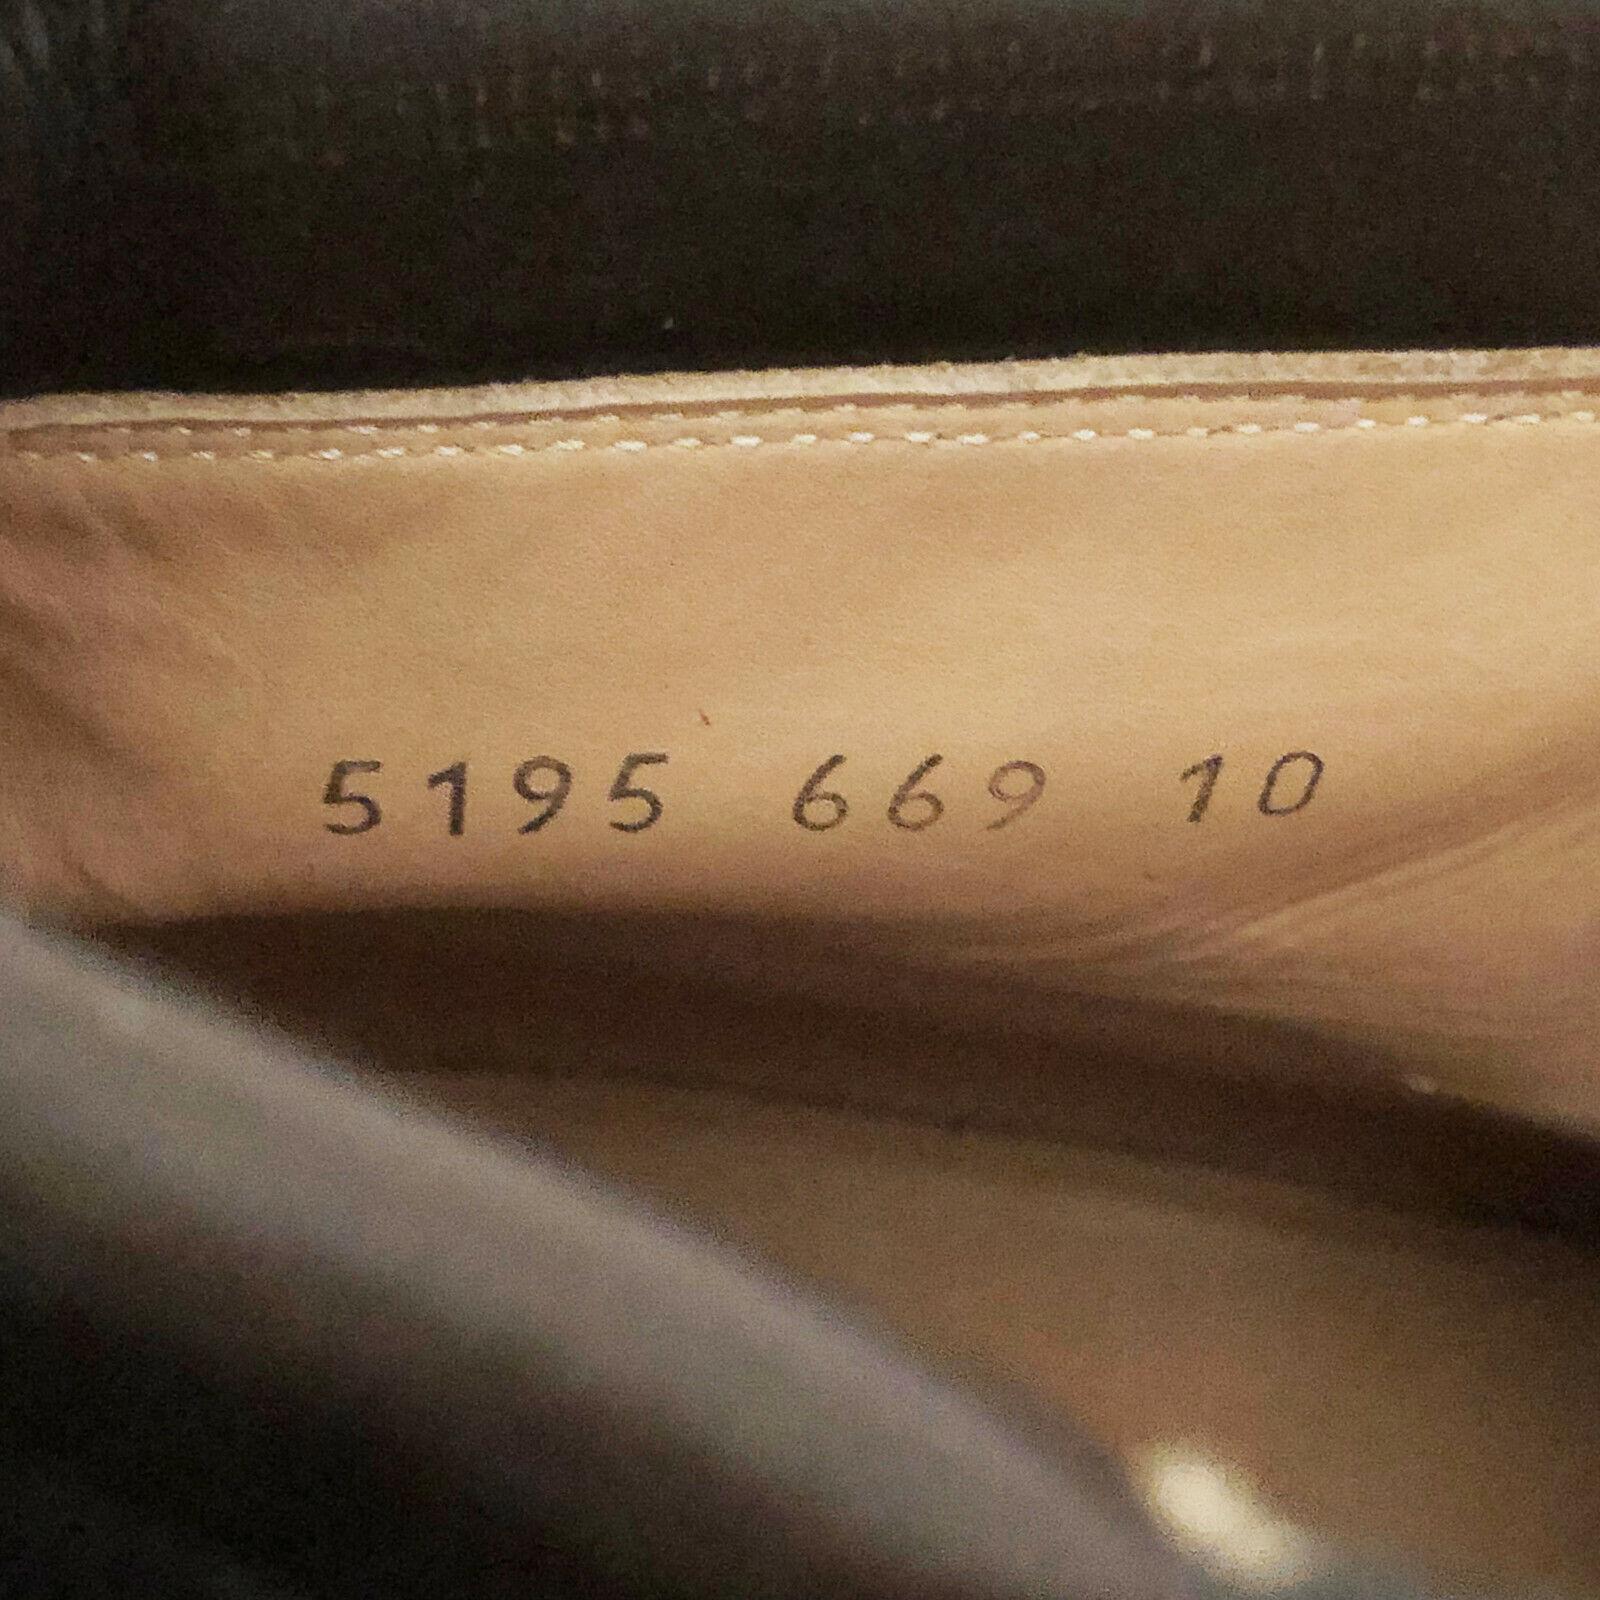 PELUSO PELUSO PELUSO NAPOLI herren braun FINE SUEDE LACE UP ANKLE Stiefel 11 U.S. e9a59c